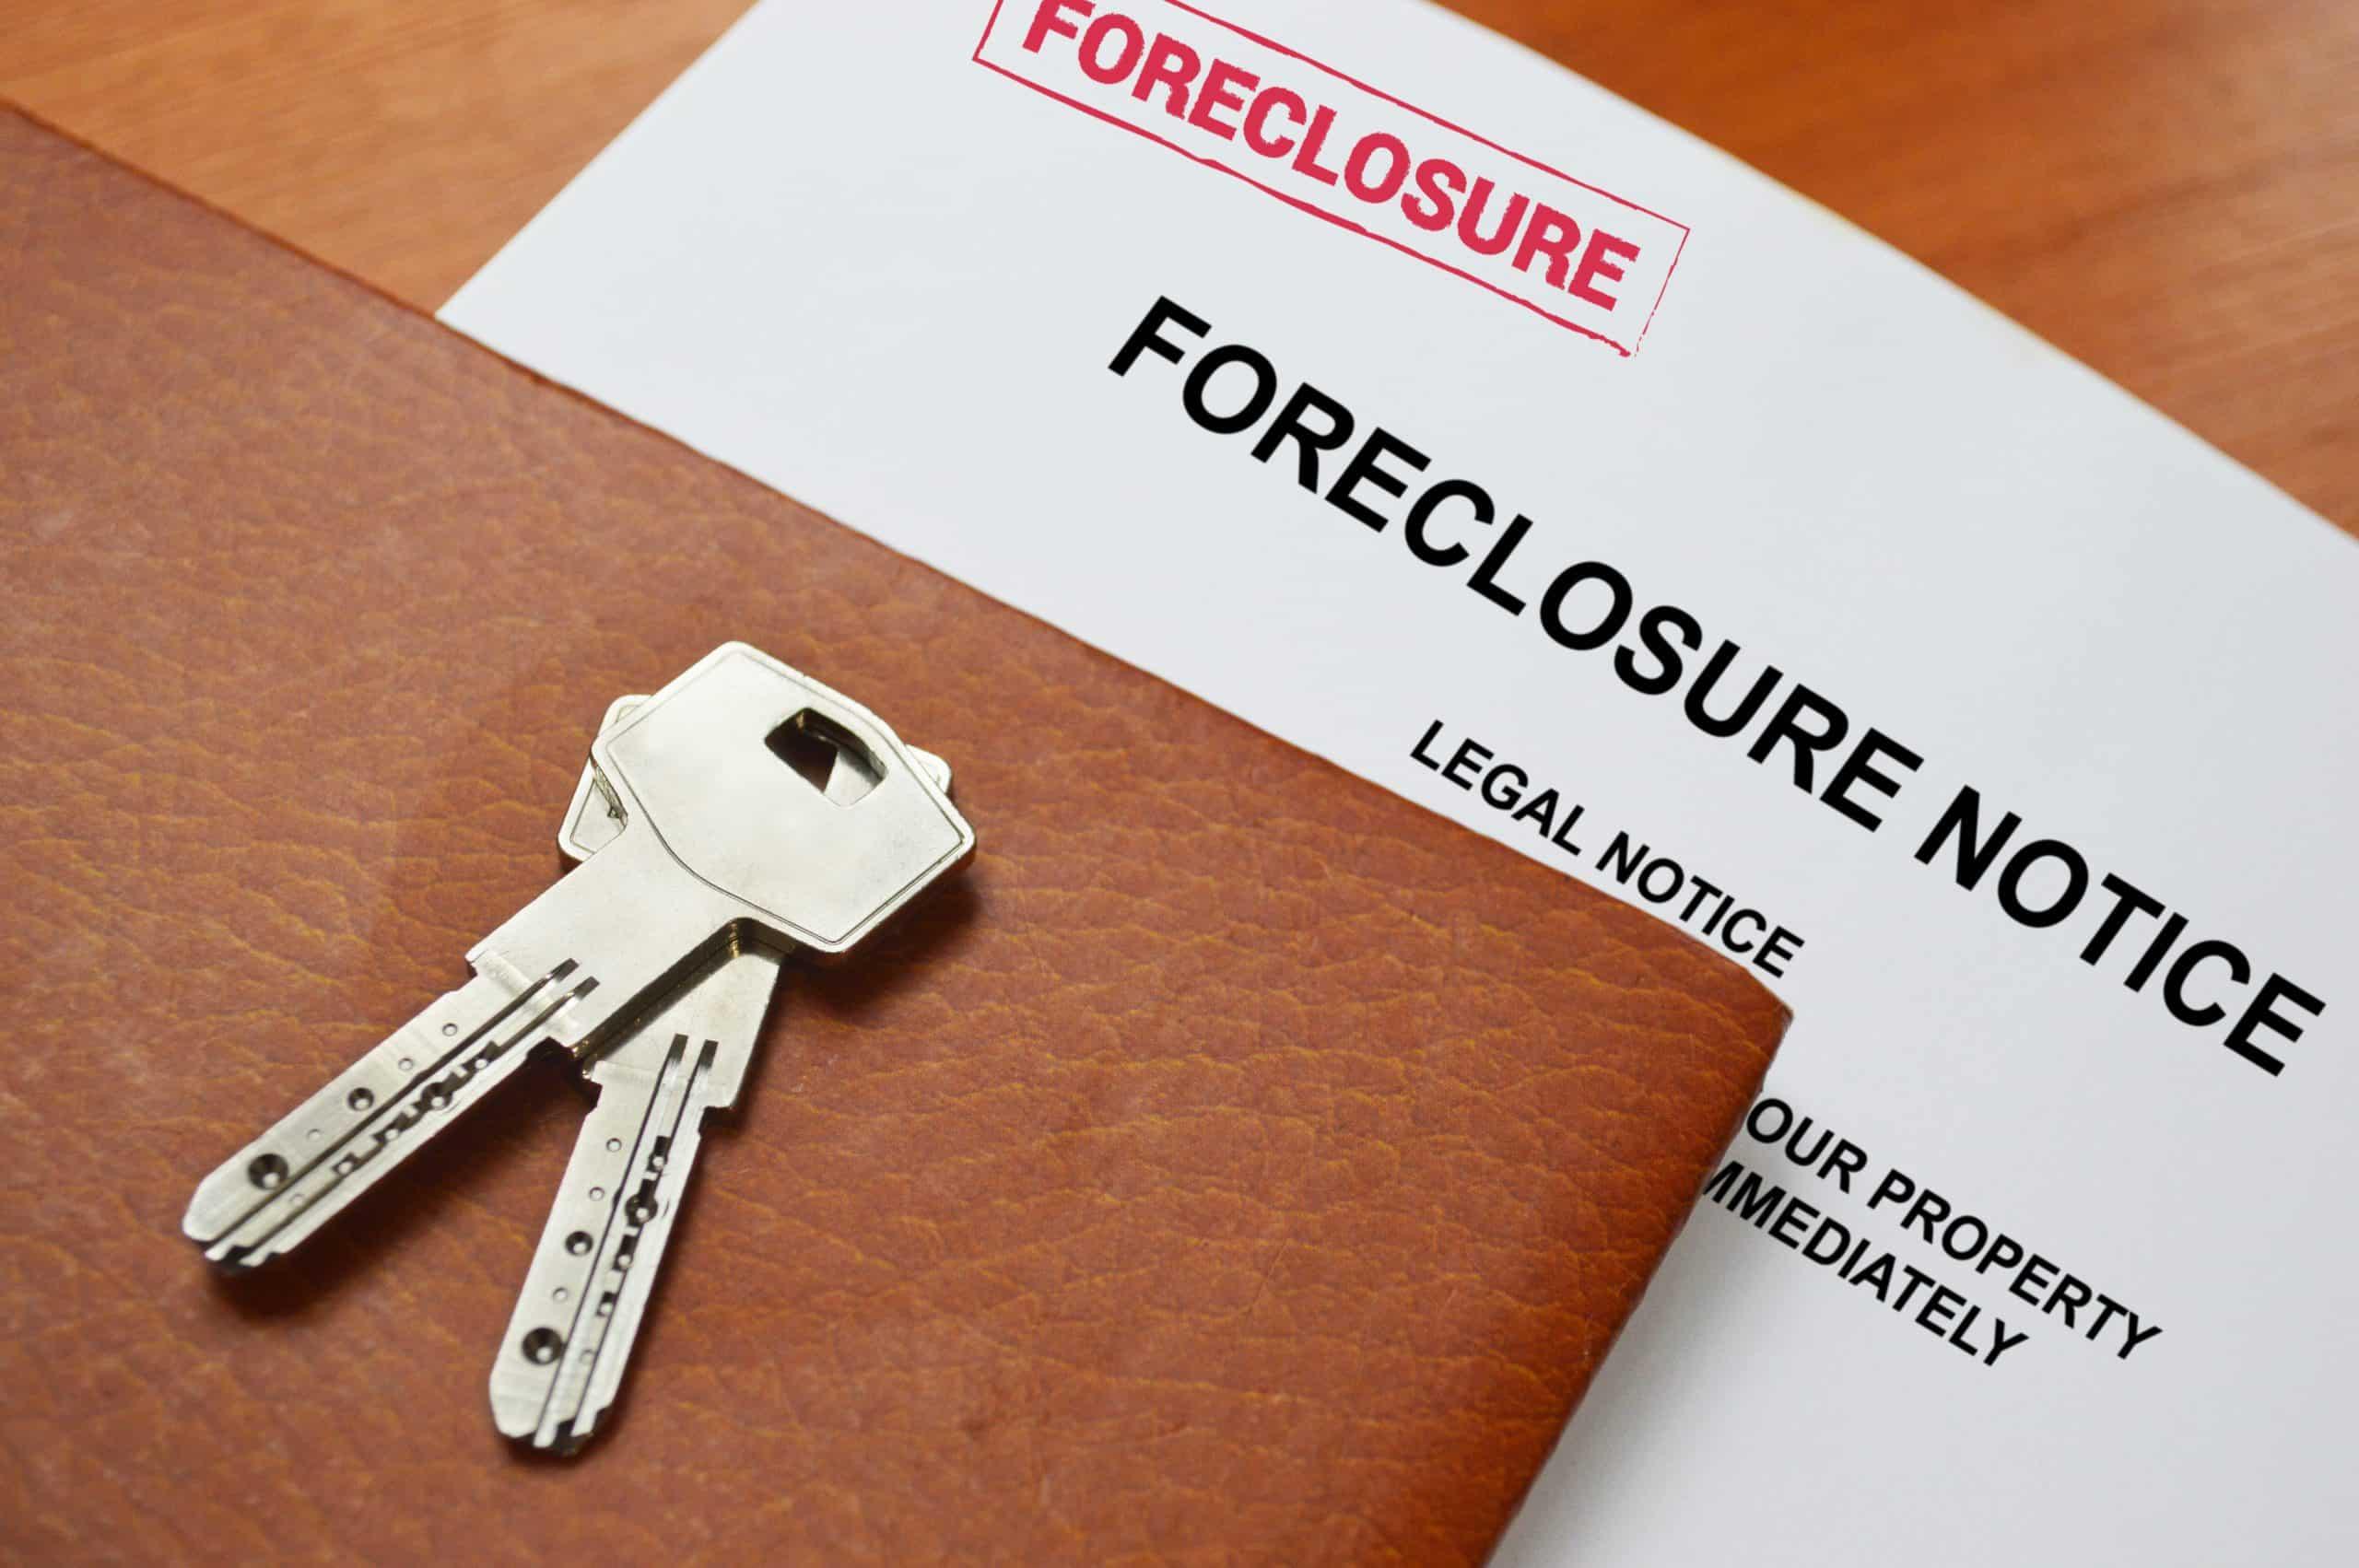 Foreclosure Ogden UT